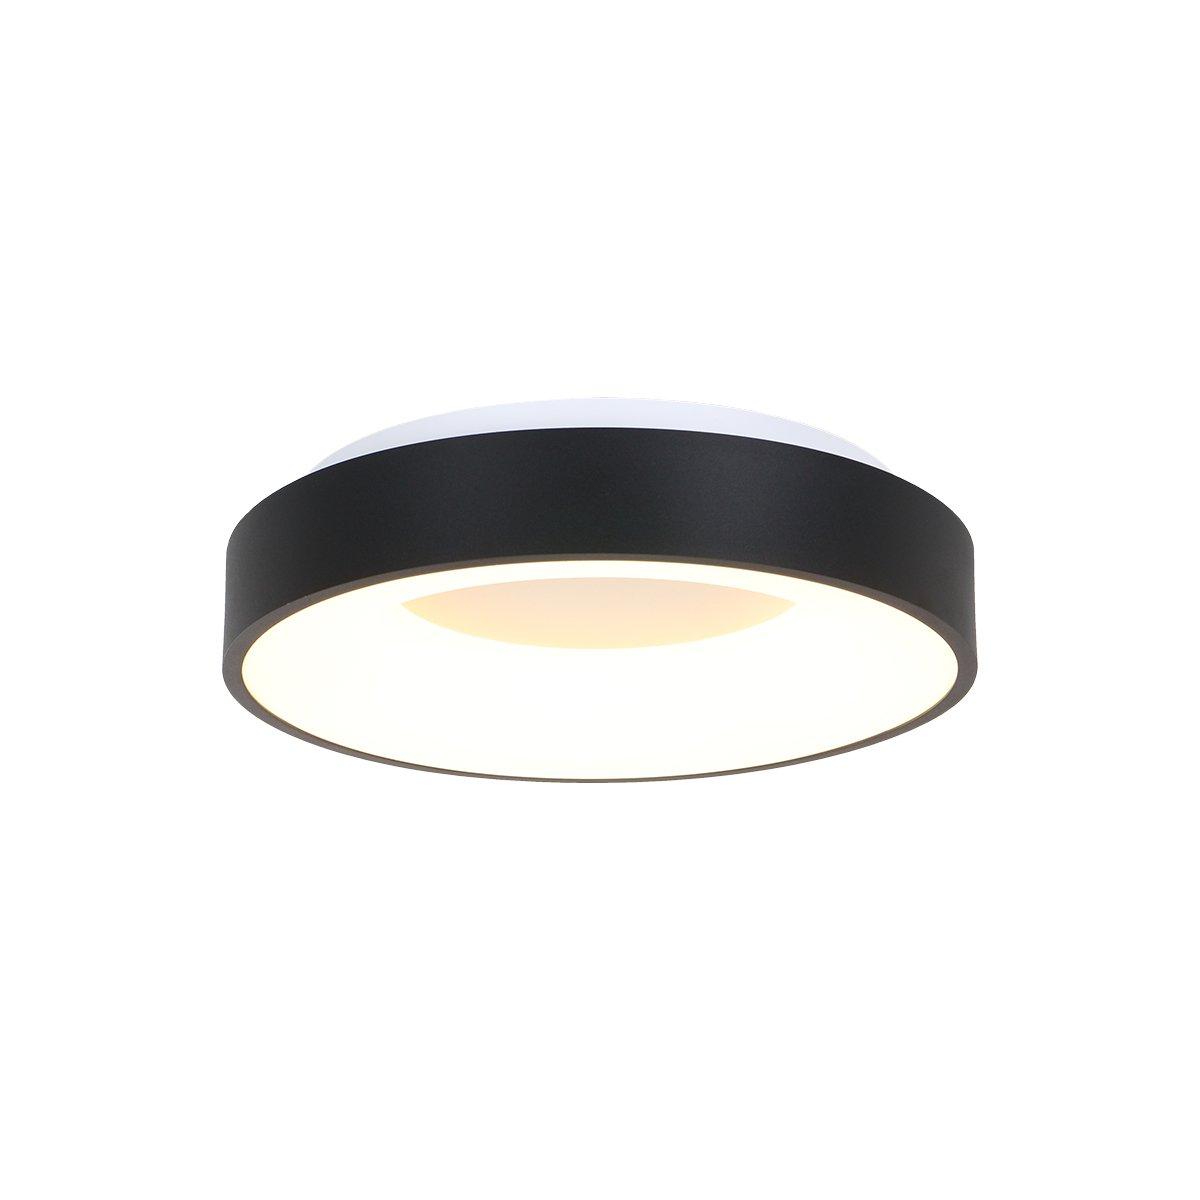 Plafondlamp Steinhauer 2562 Zwart